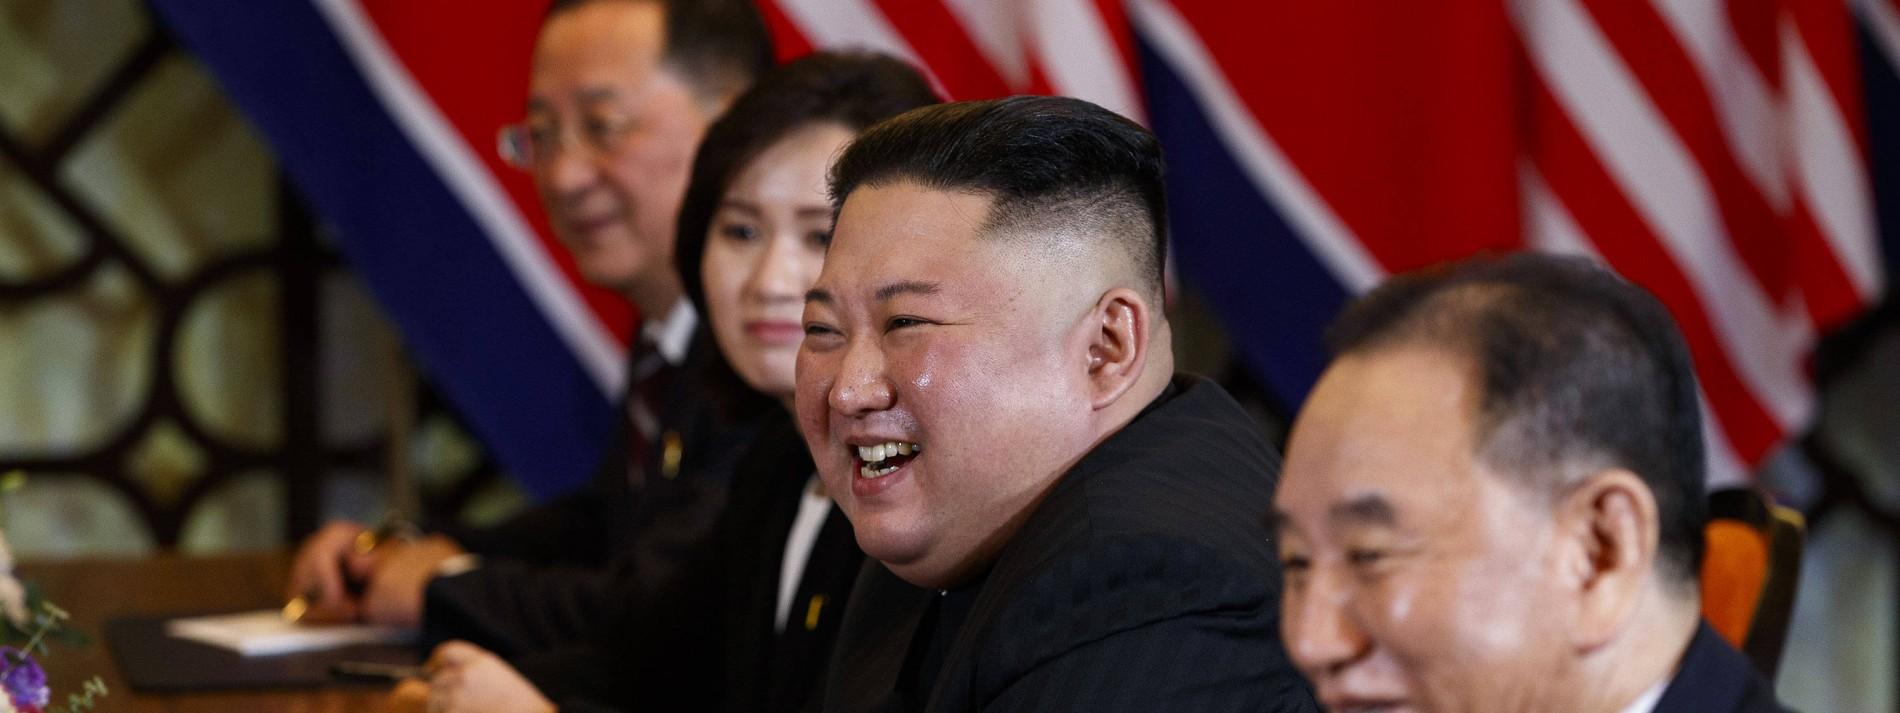 Nordkorea nimmt umstrittenen Atomreaktor wieder in Betrieb